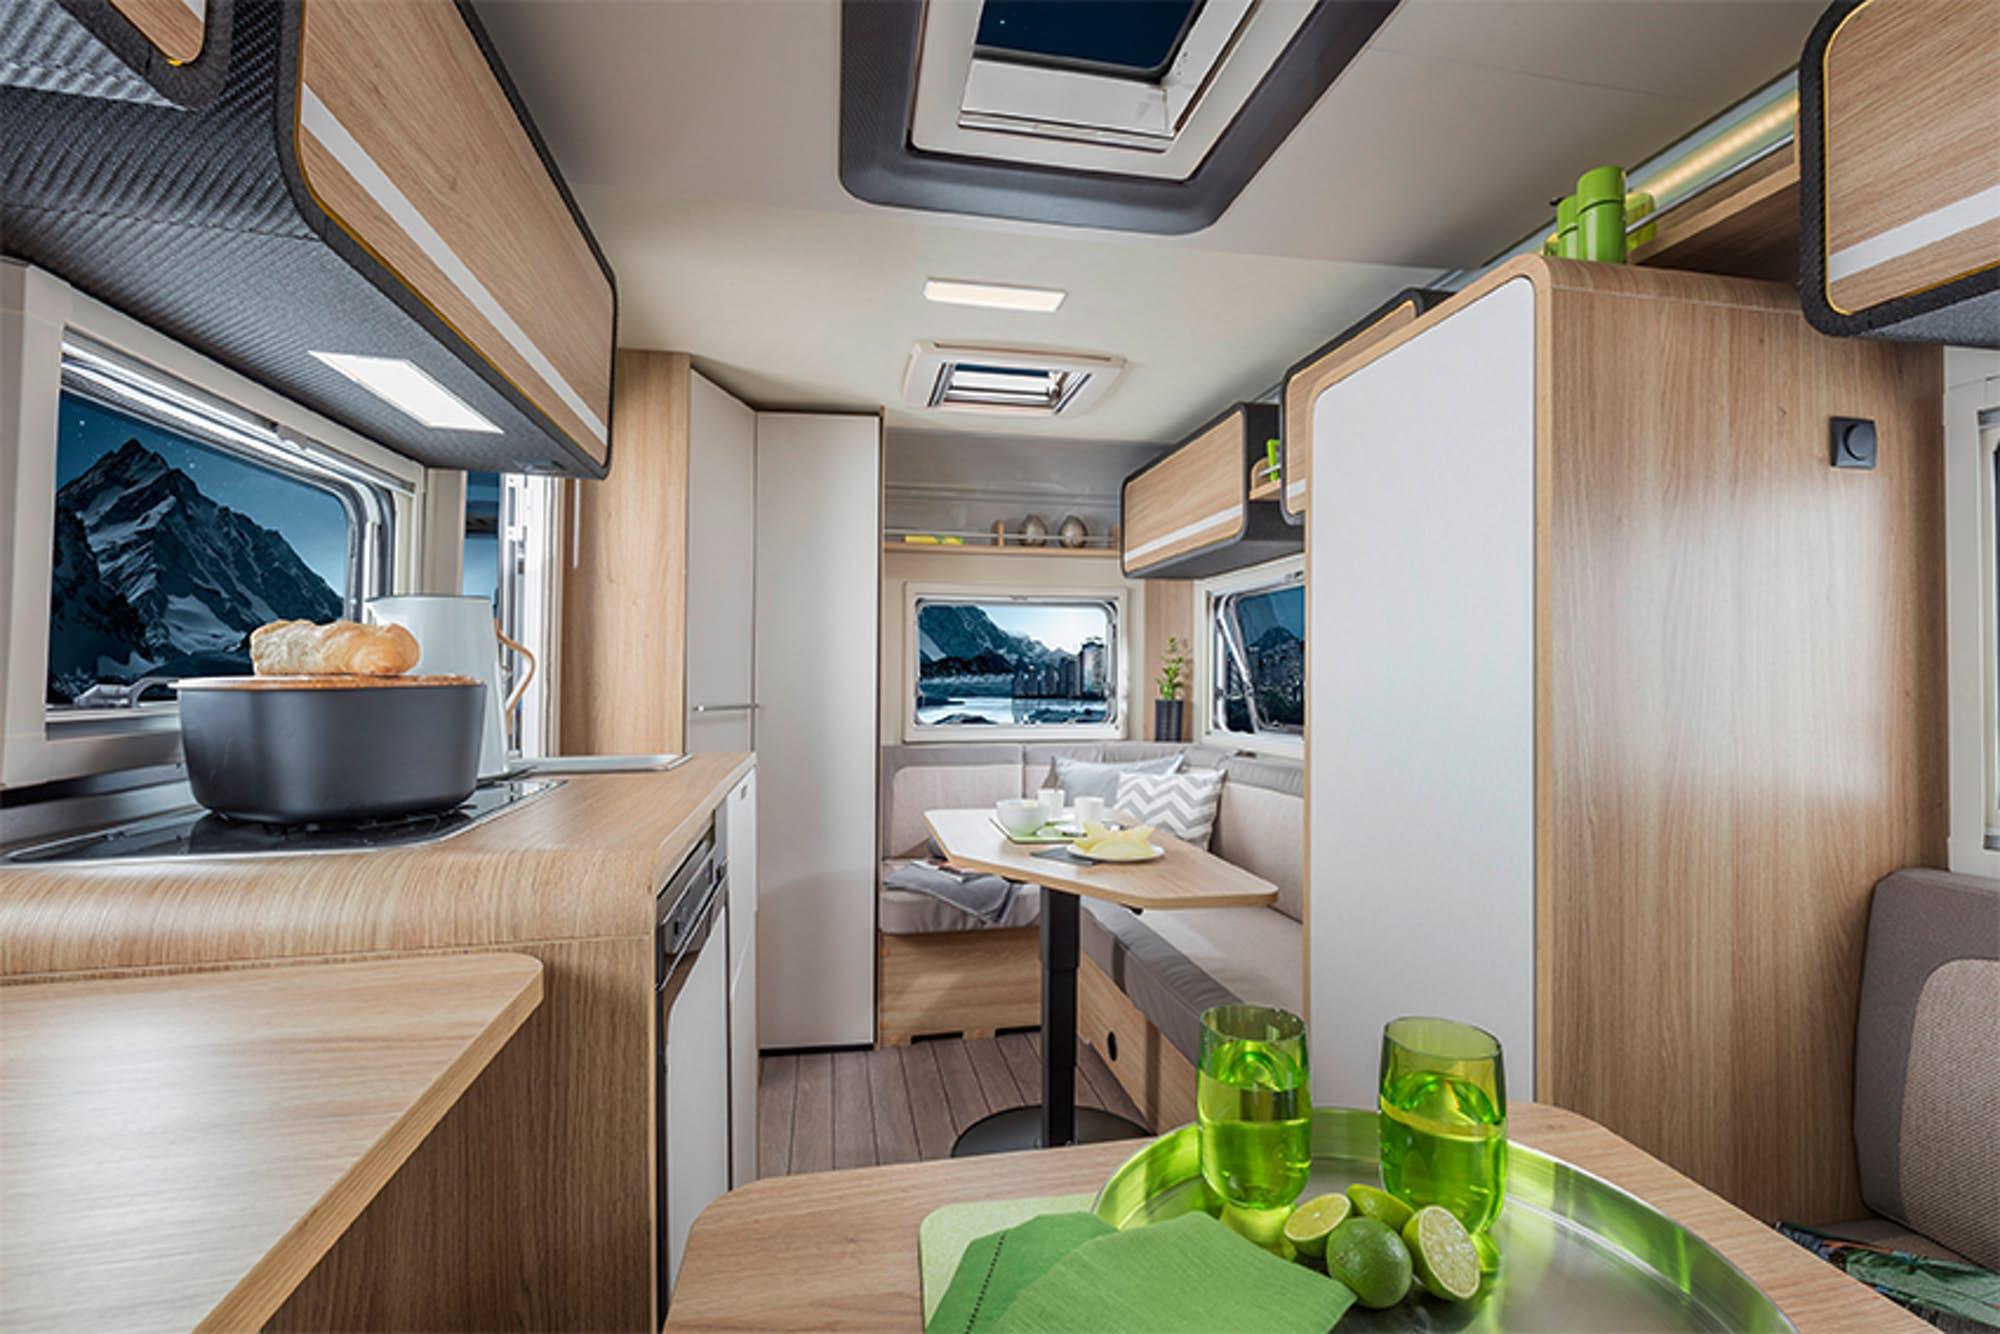 High-tech camper features adjustable smart glass window